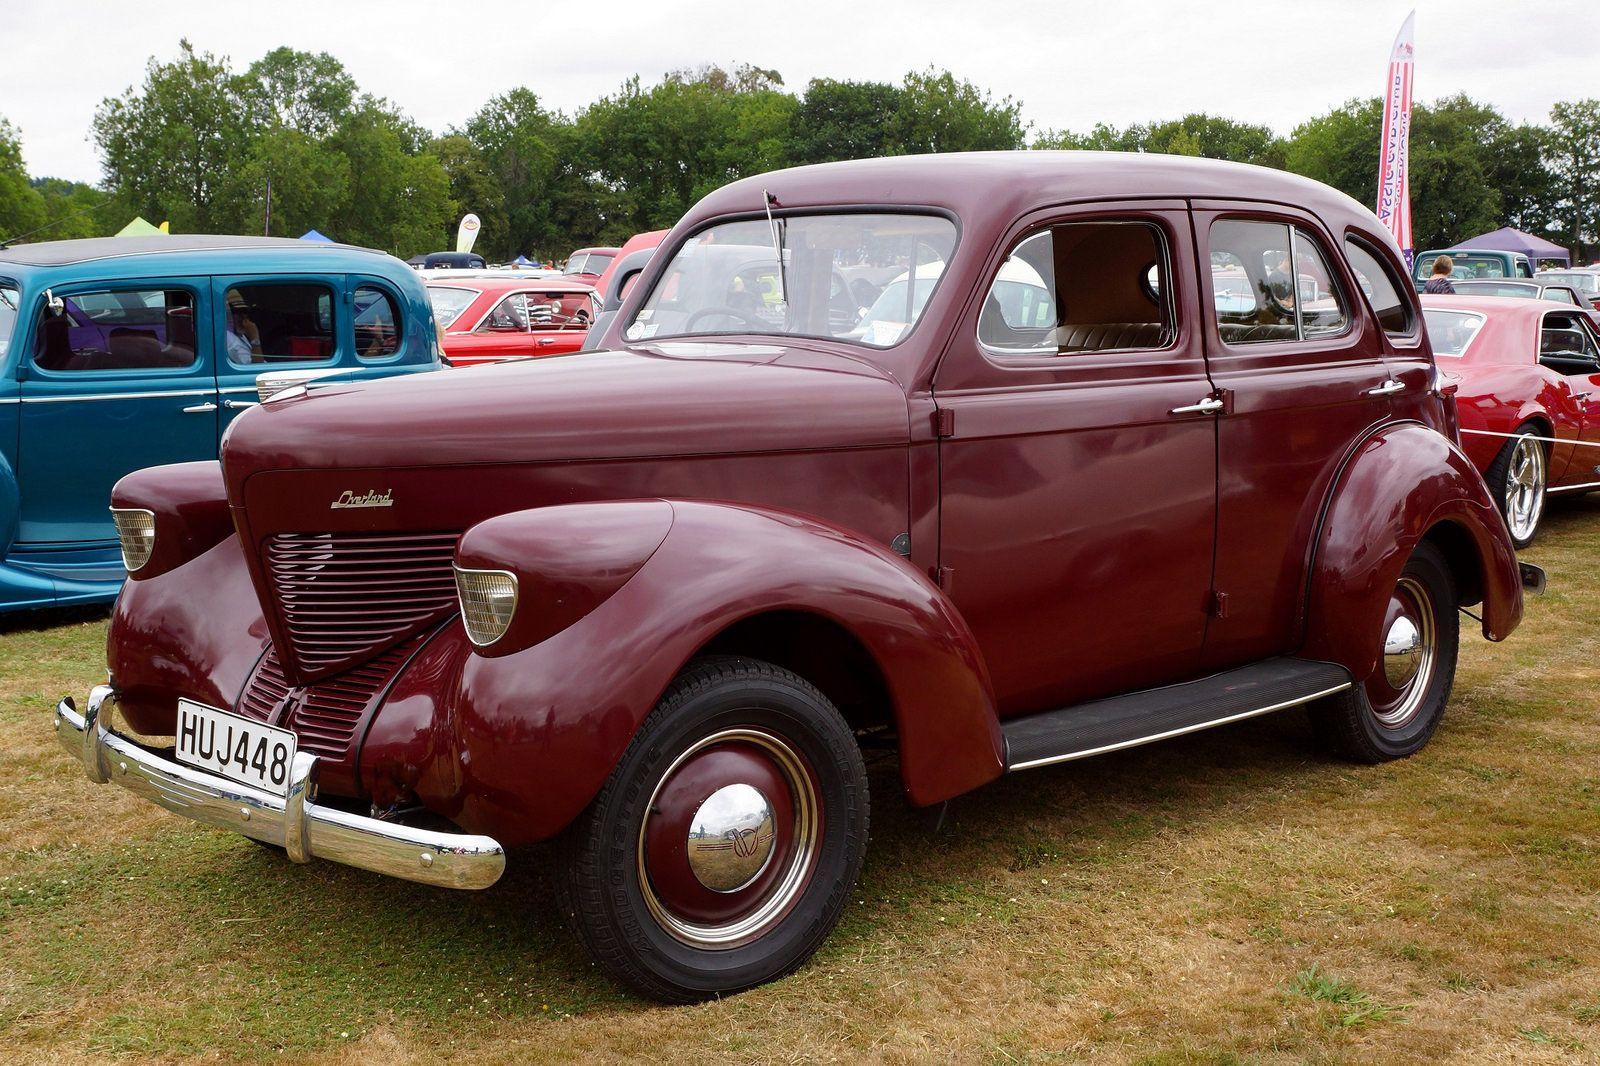 1939 Willys Overland Sedan